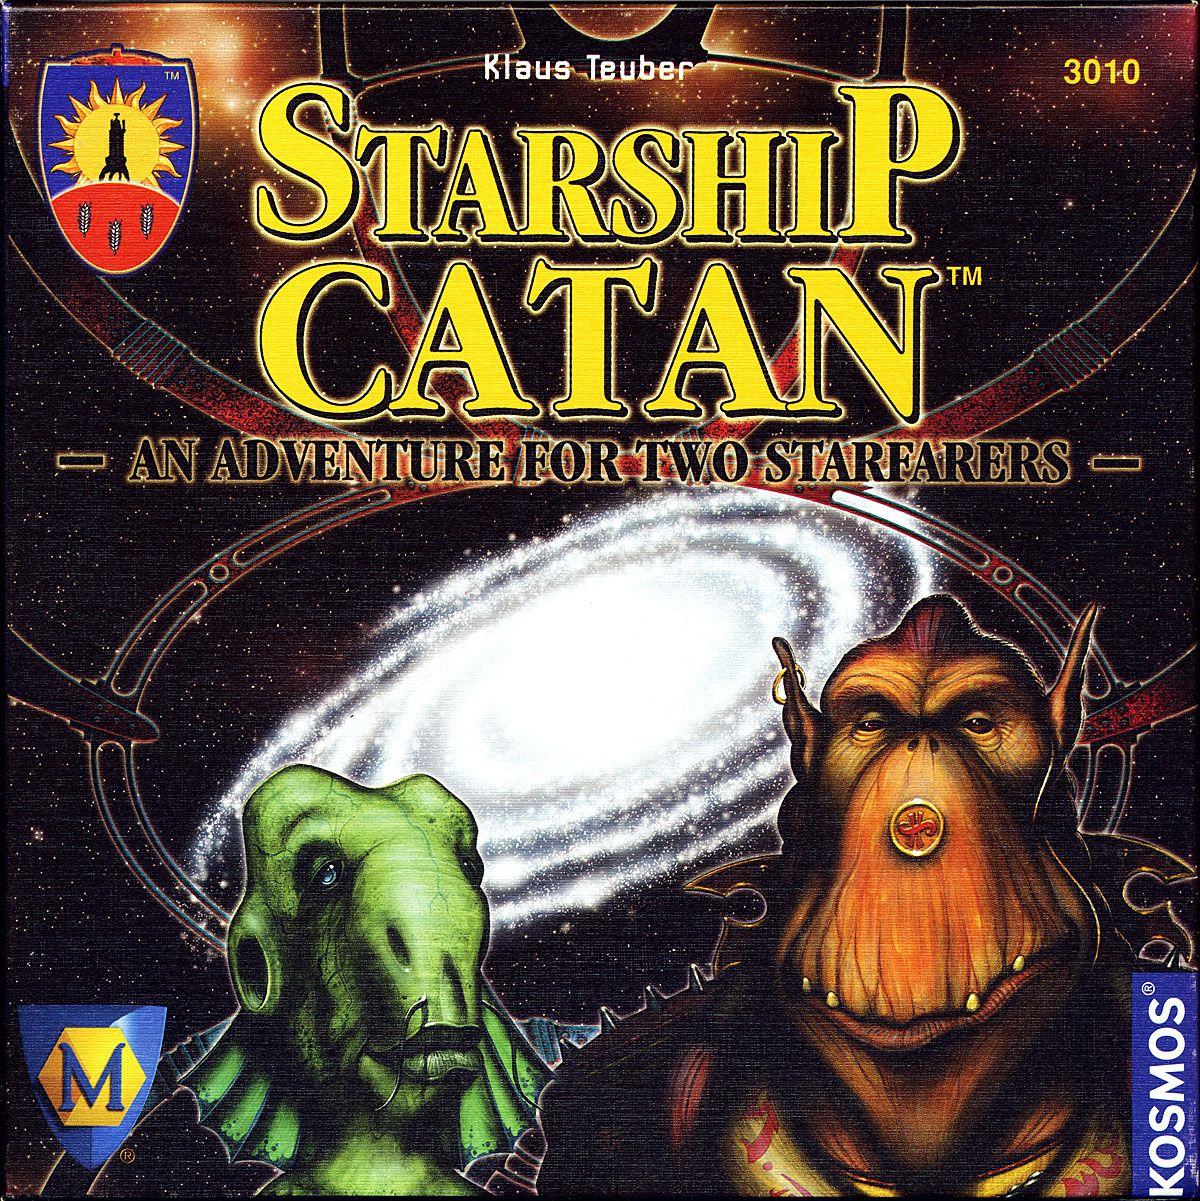 Starship Catan Catan, Starship